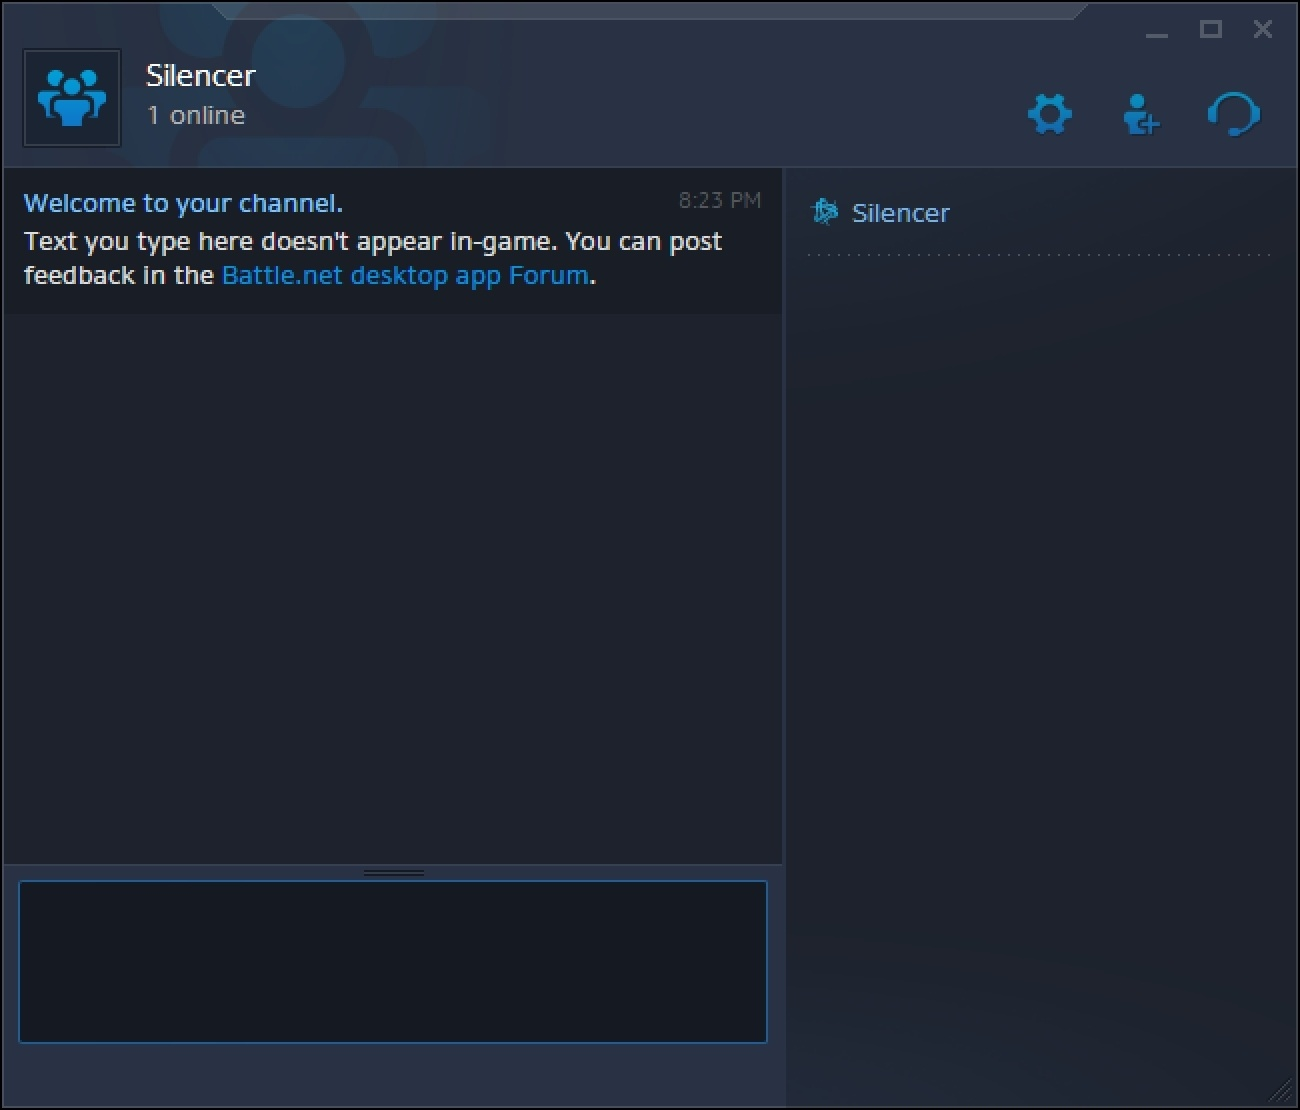 New Battlenet Patch Blizzard Voice Chat Channels Patch Notes